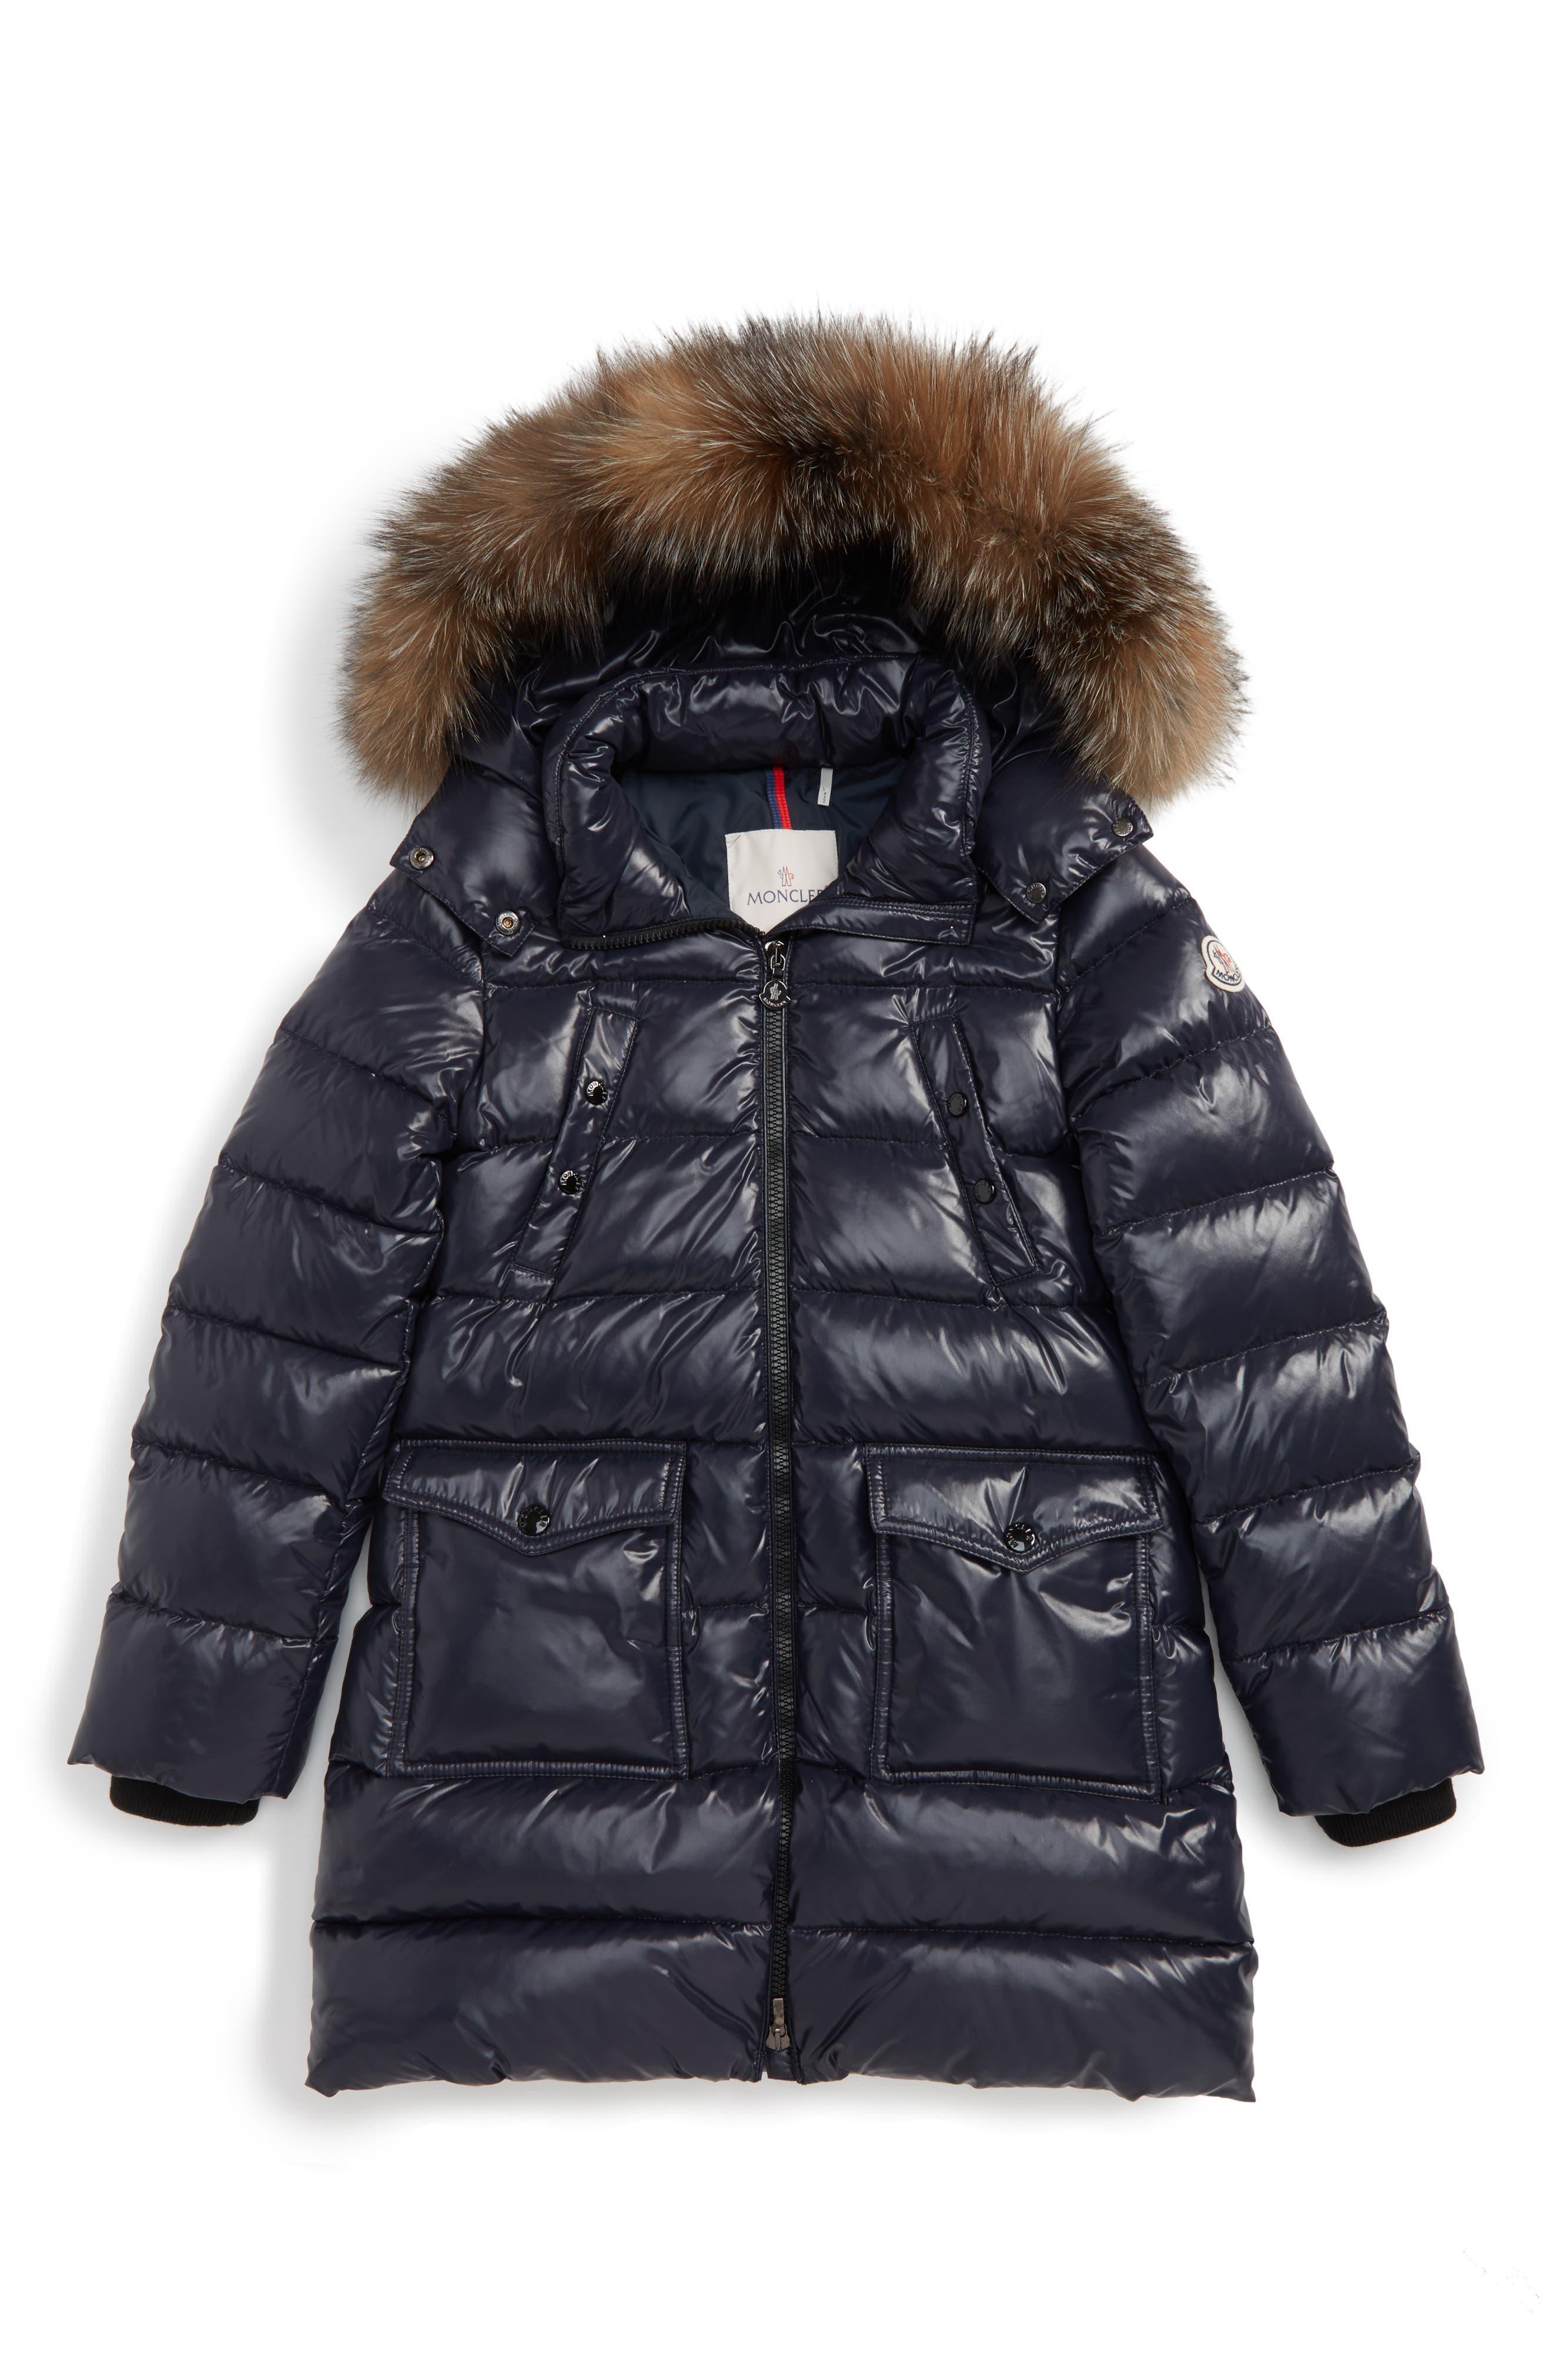 Fragont Down Parka with Genuine Fox Fur Trim,                             Main thumbnail 1, color,